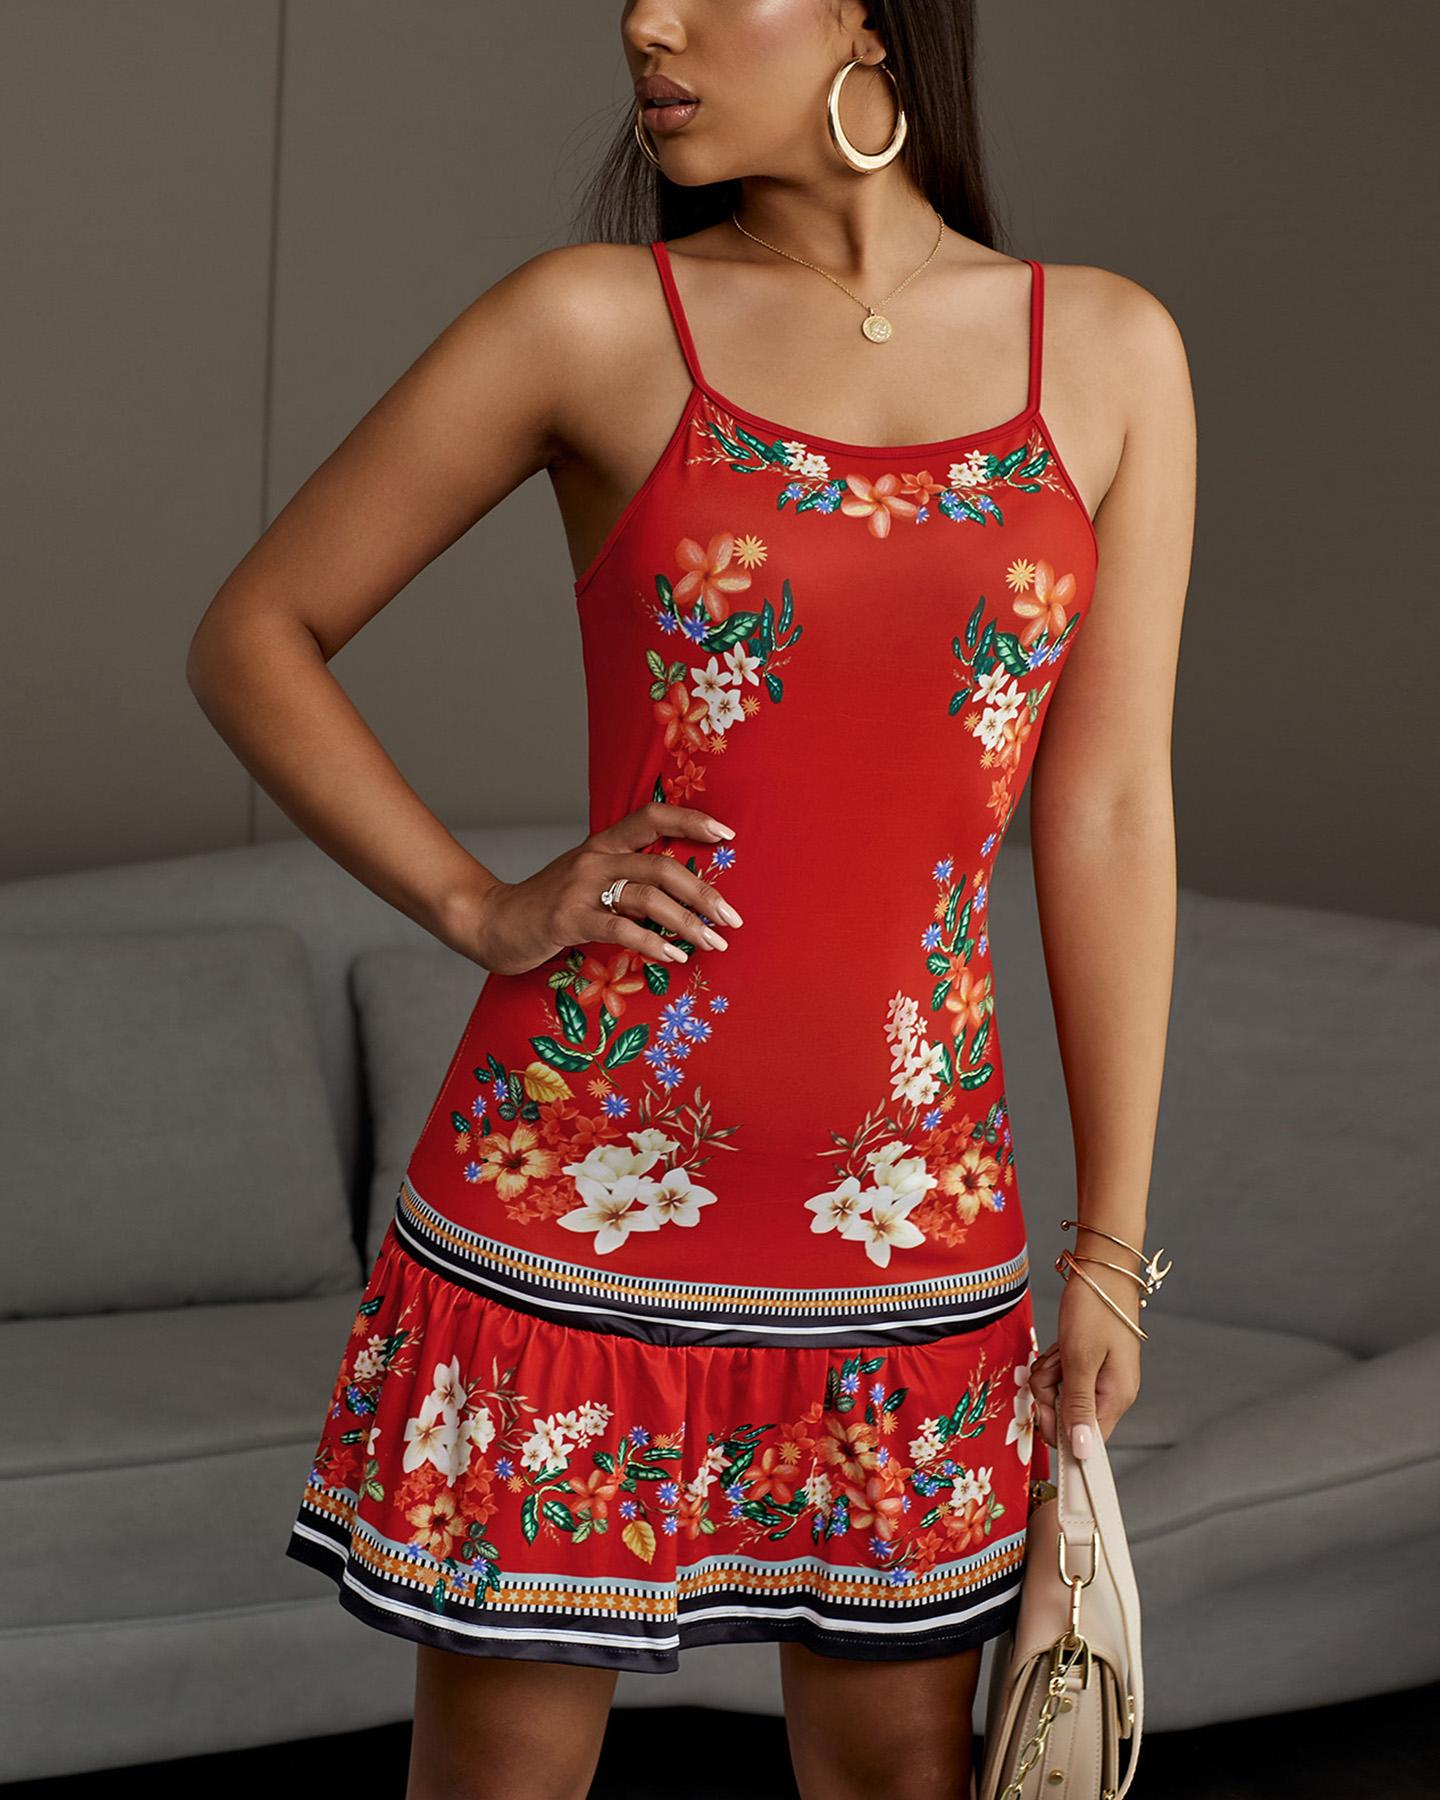 Spaghetti Strap Backless Floral Print Dress